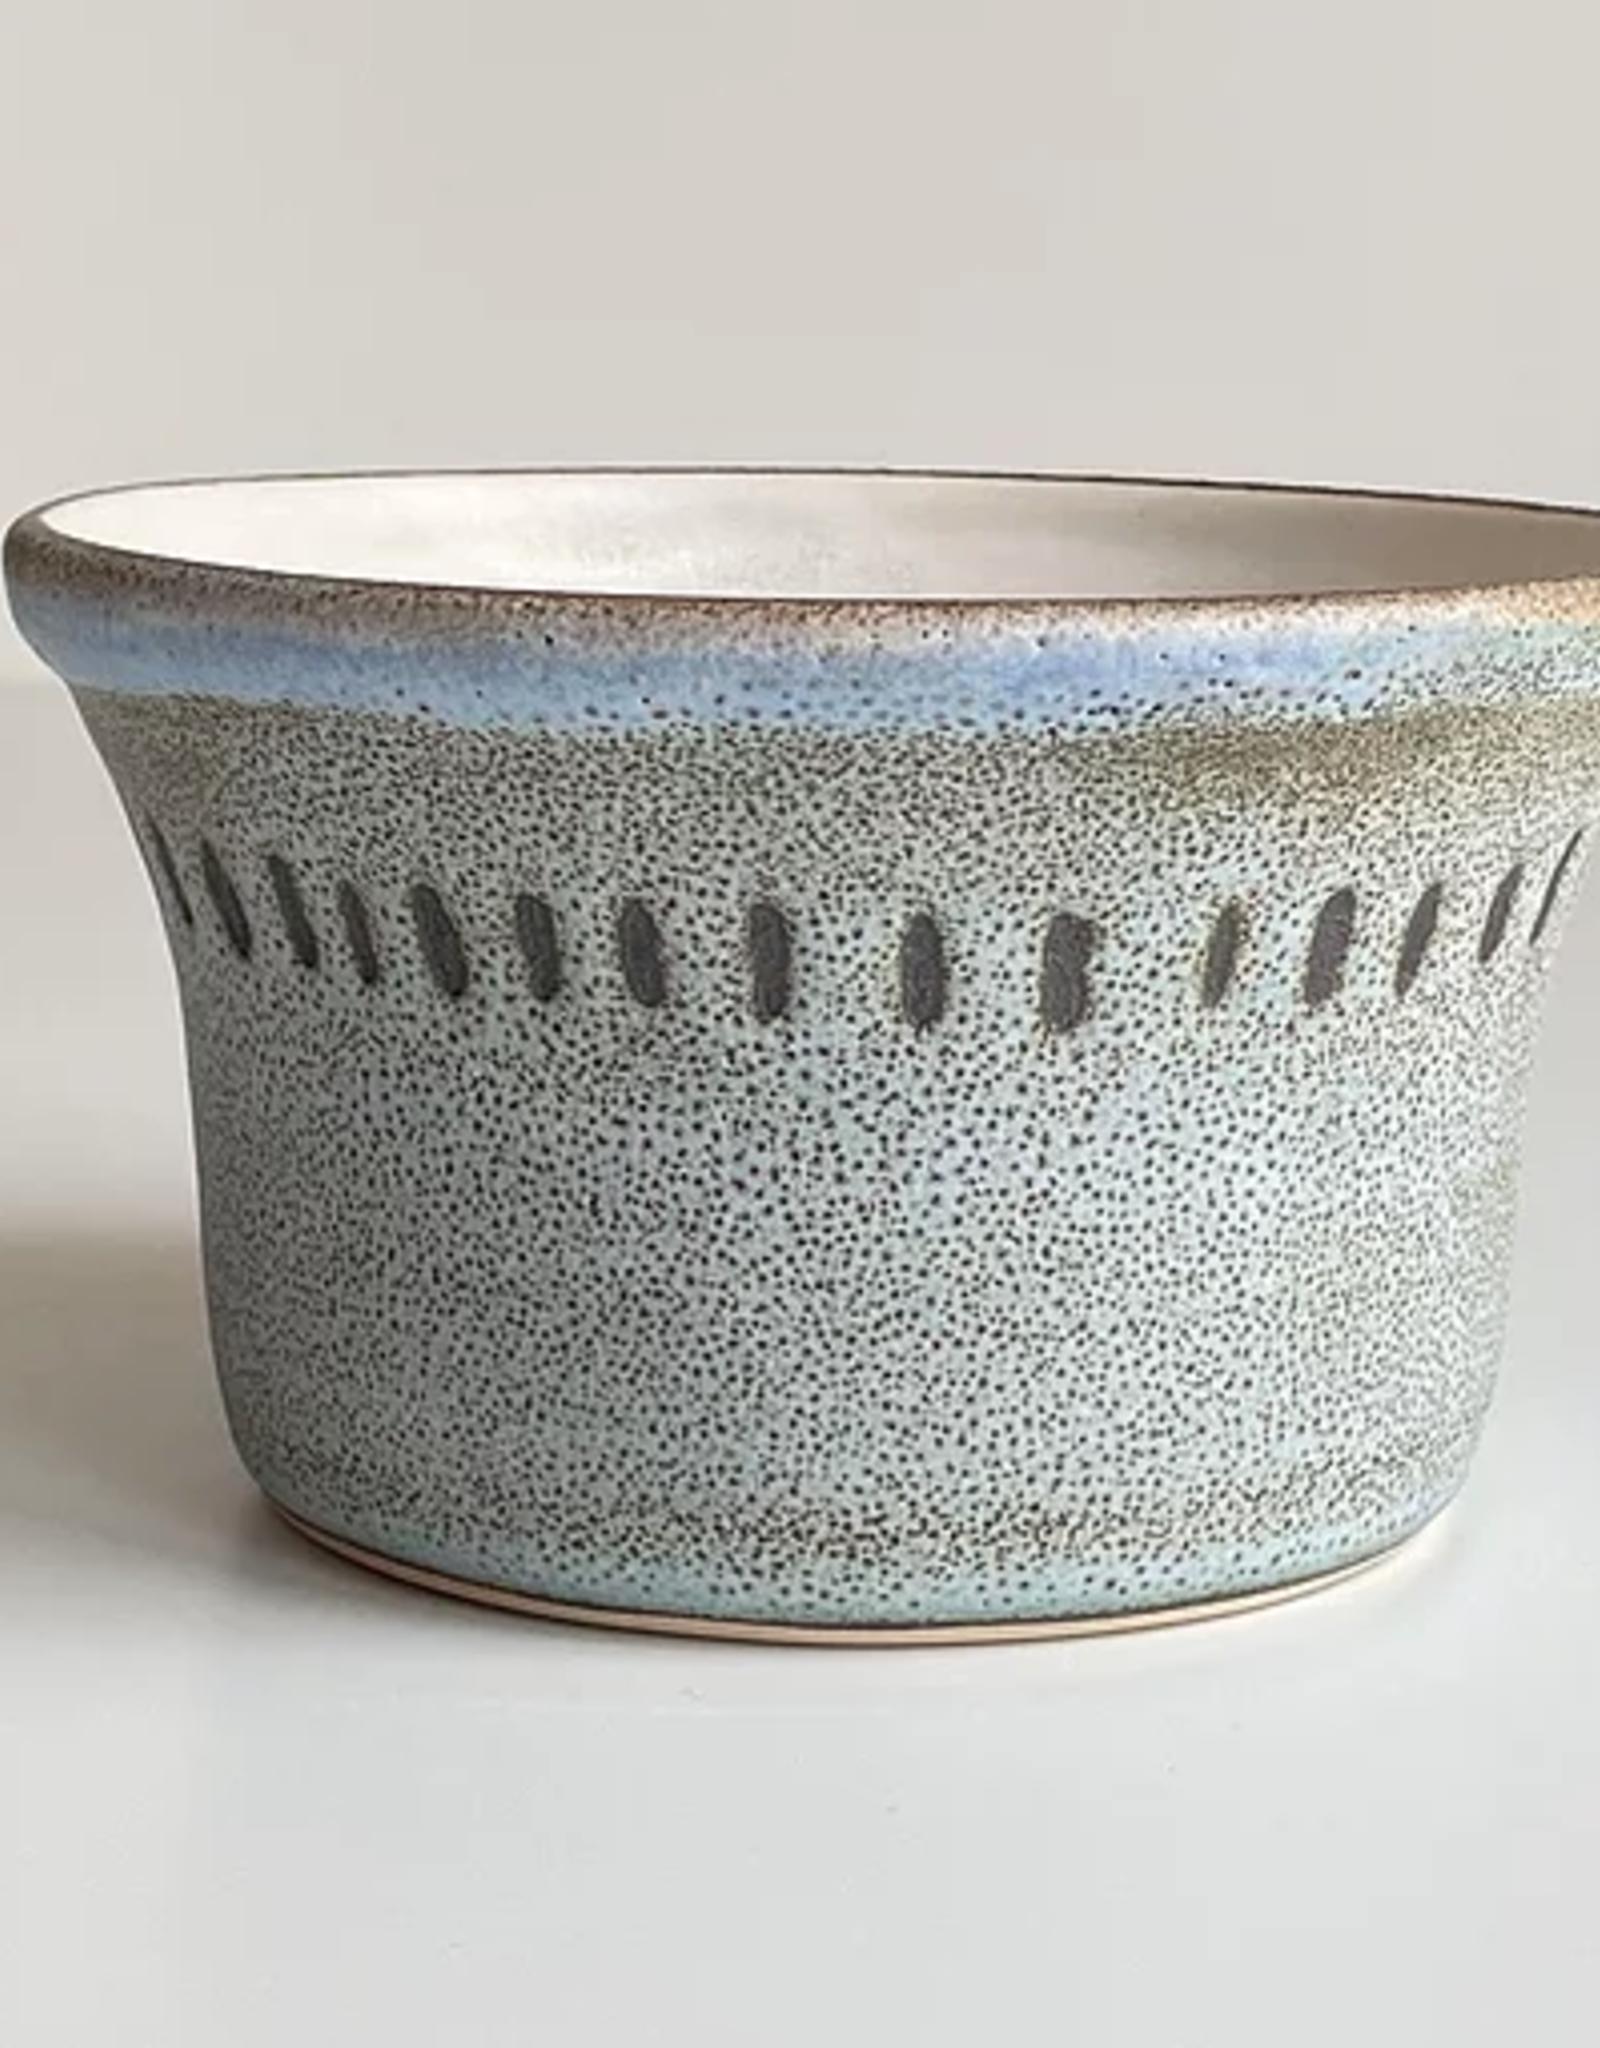 Magda Bethani MBC/BLBD Large bowl blue with dots